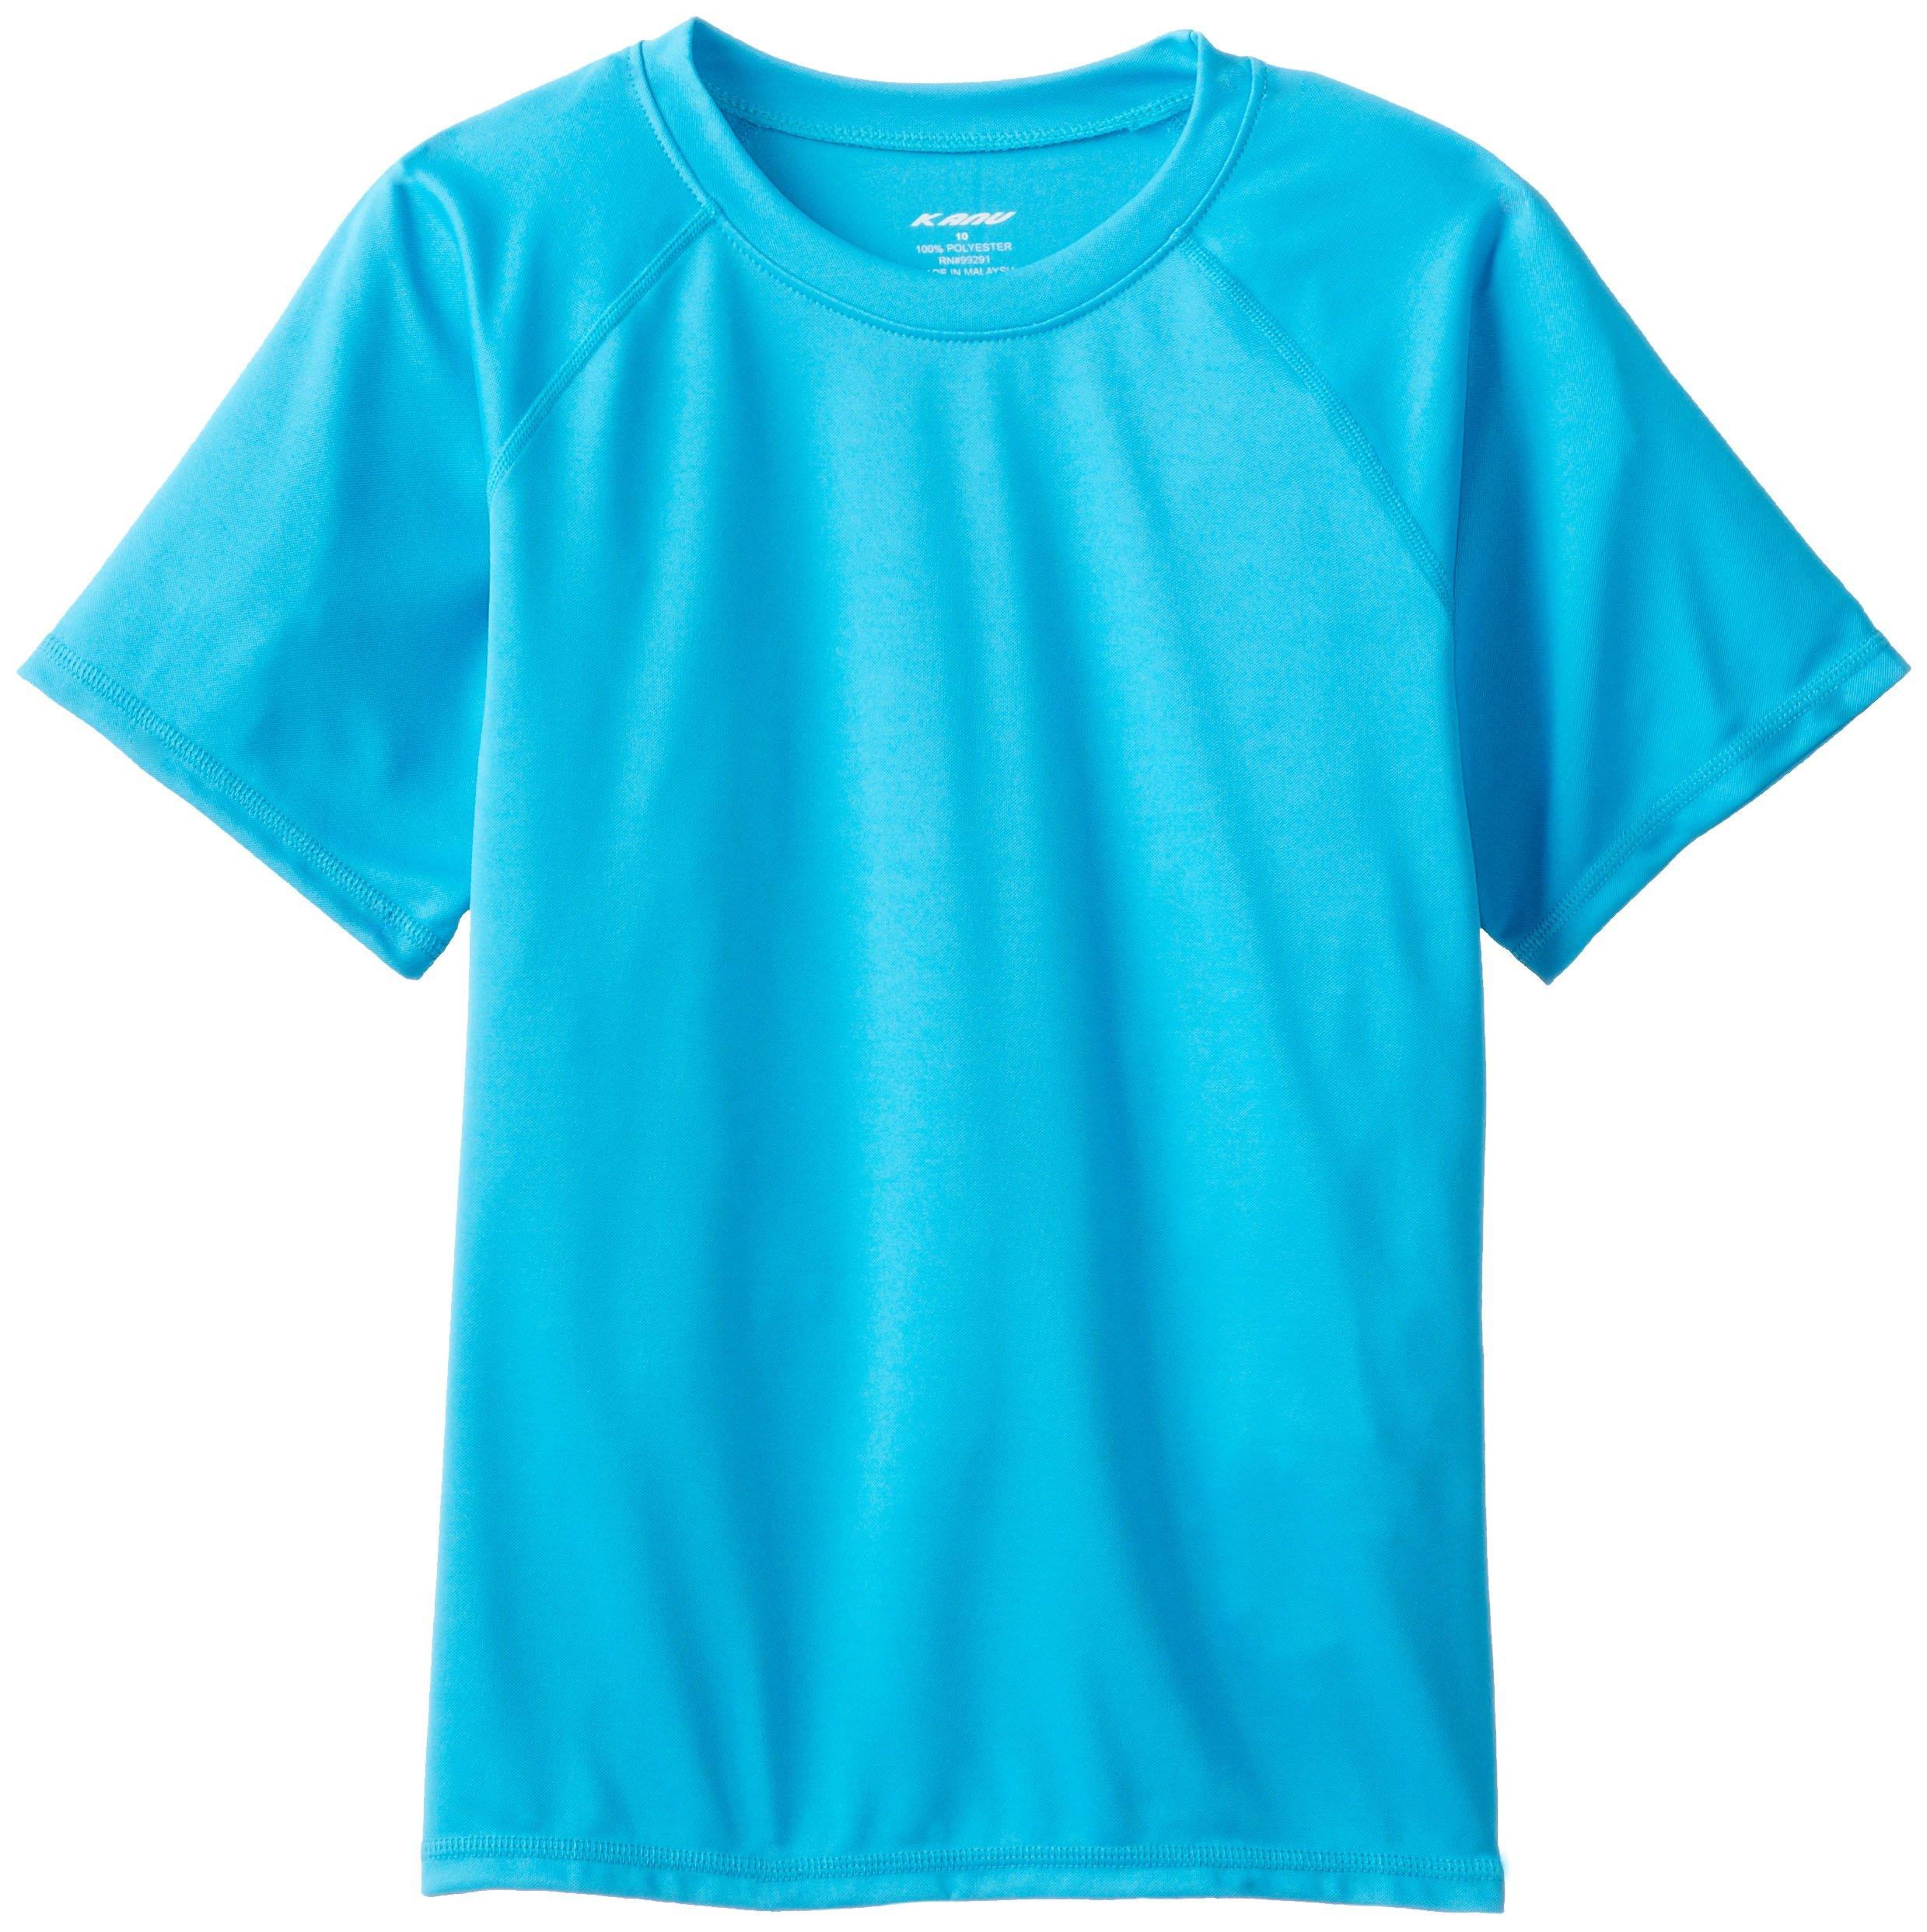 Kanu Surf Big Boys' Solid Swim Shirt, Aqua, Medium (10) by Kanu Surf